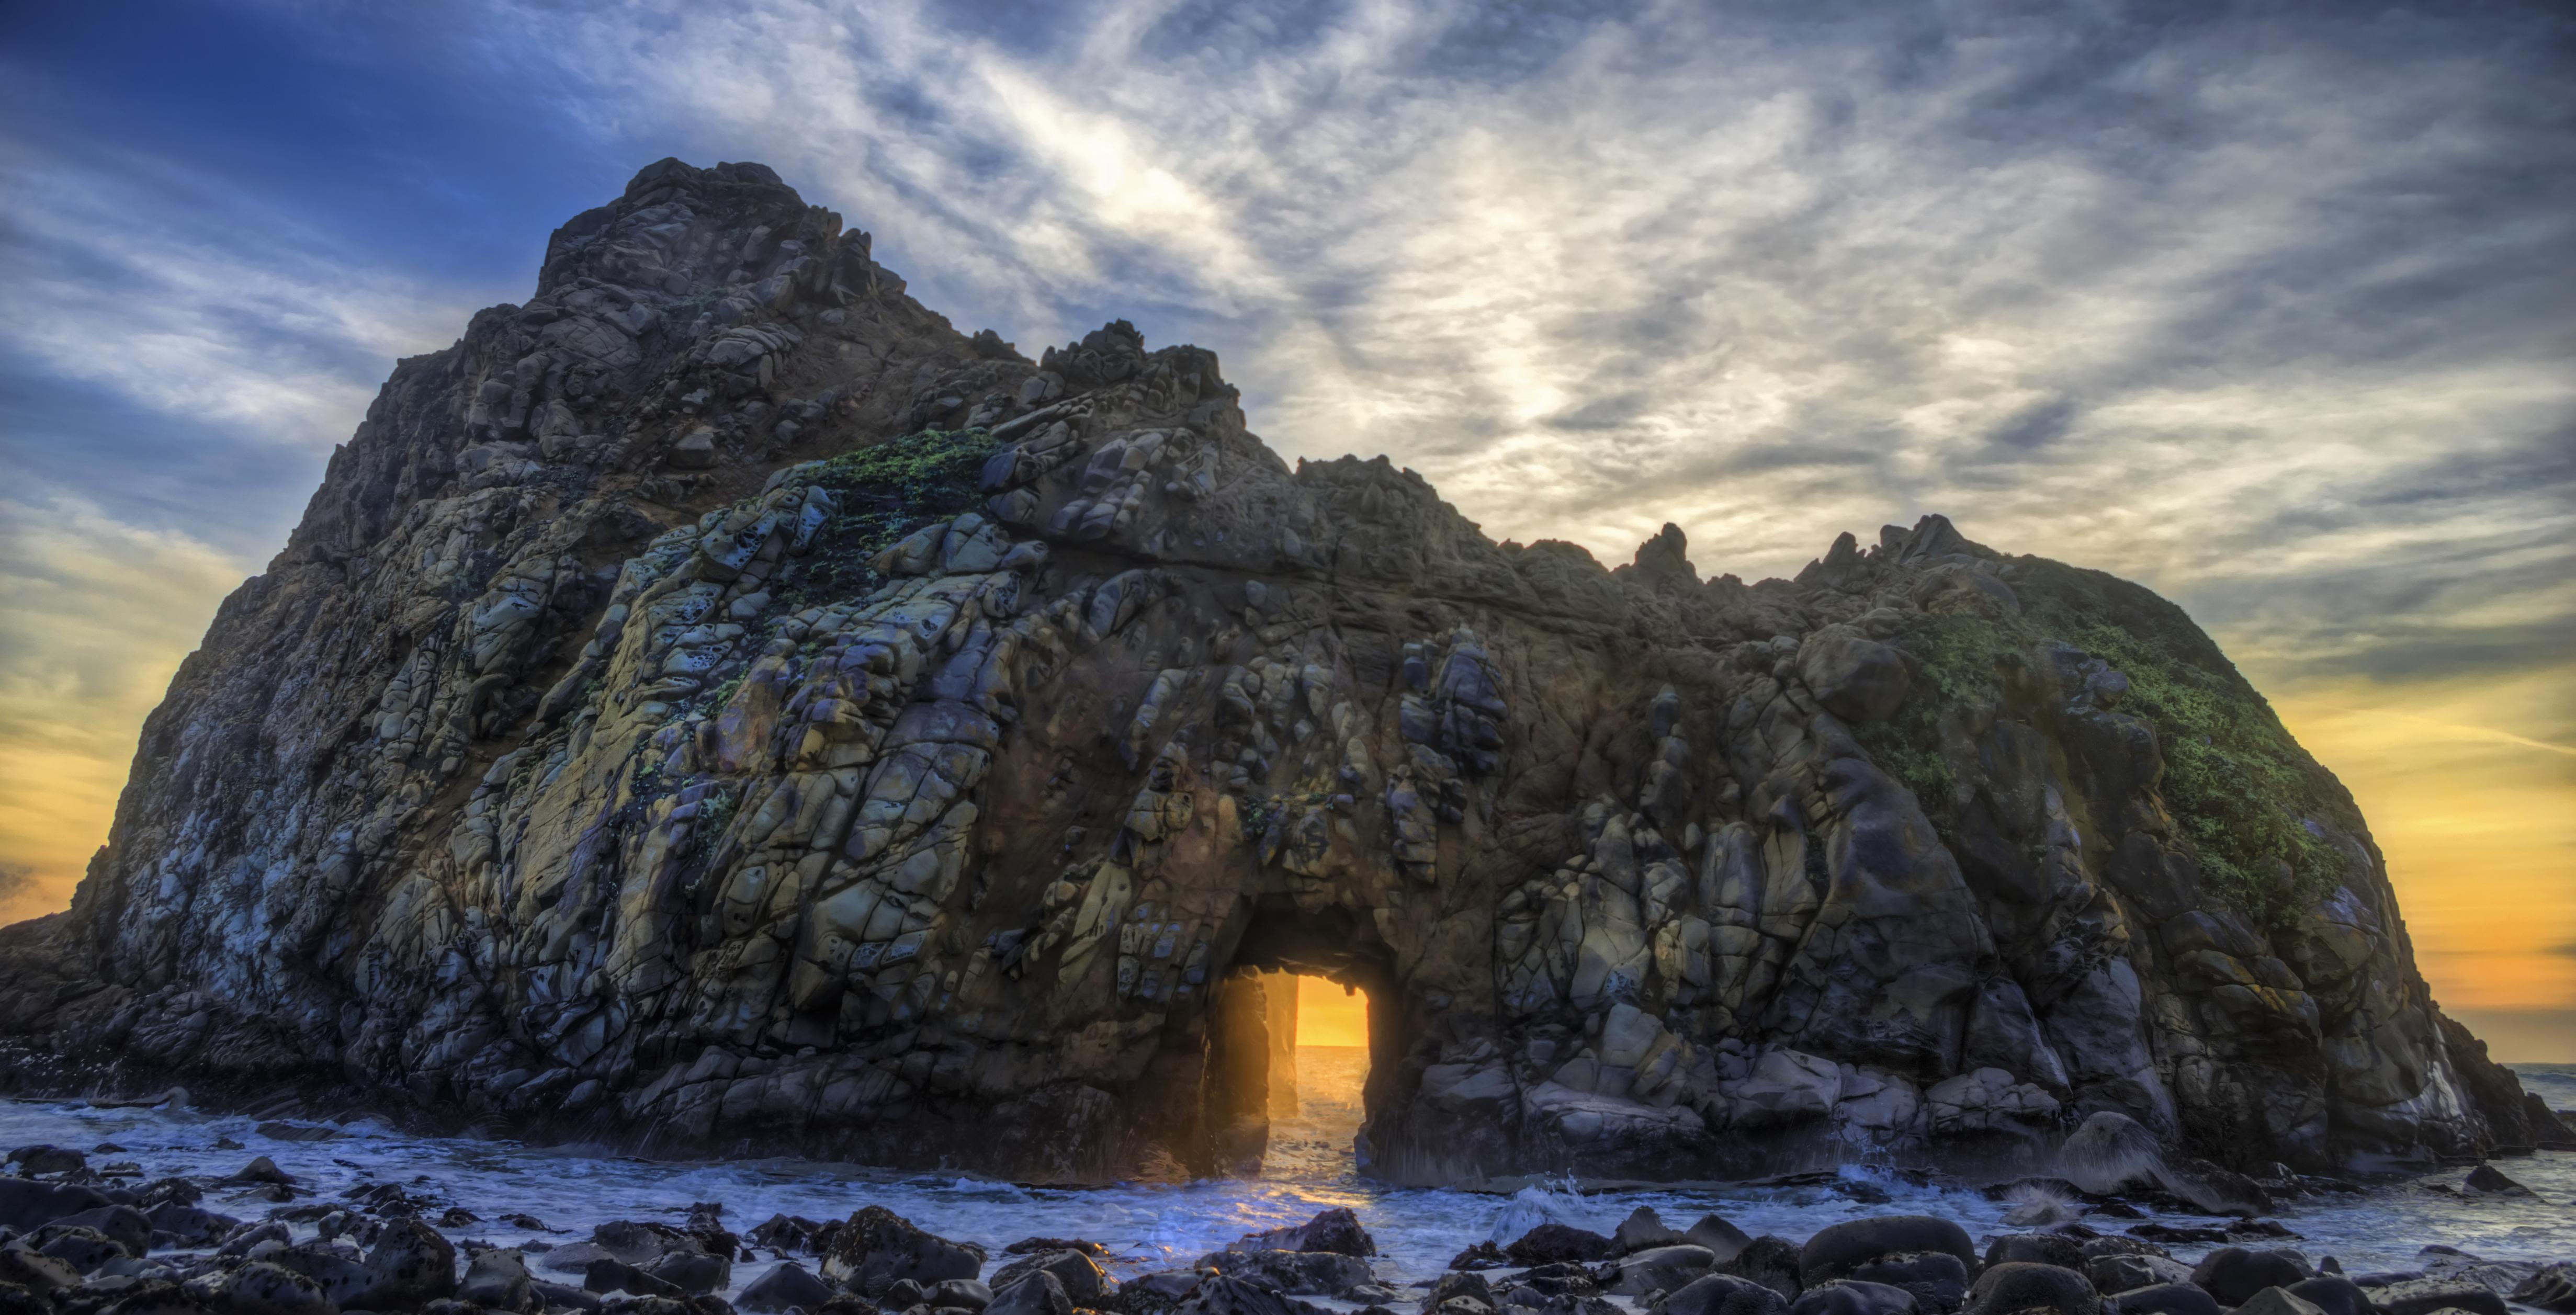 Big Sur Sunset Sunset in Big Sur | Hdr Creme